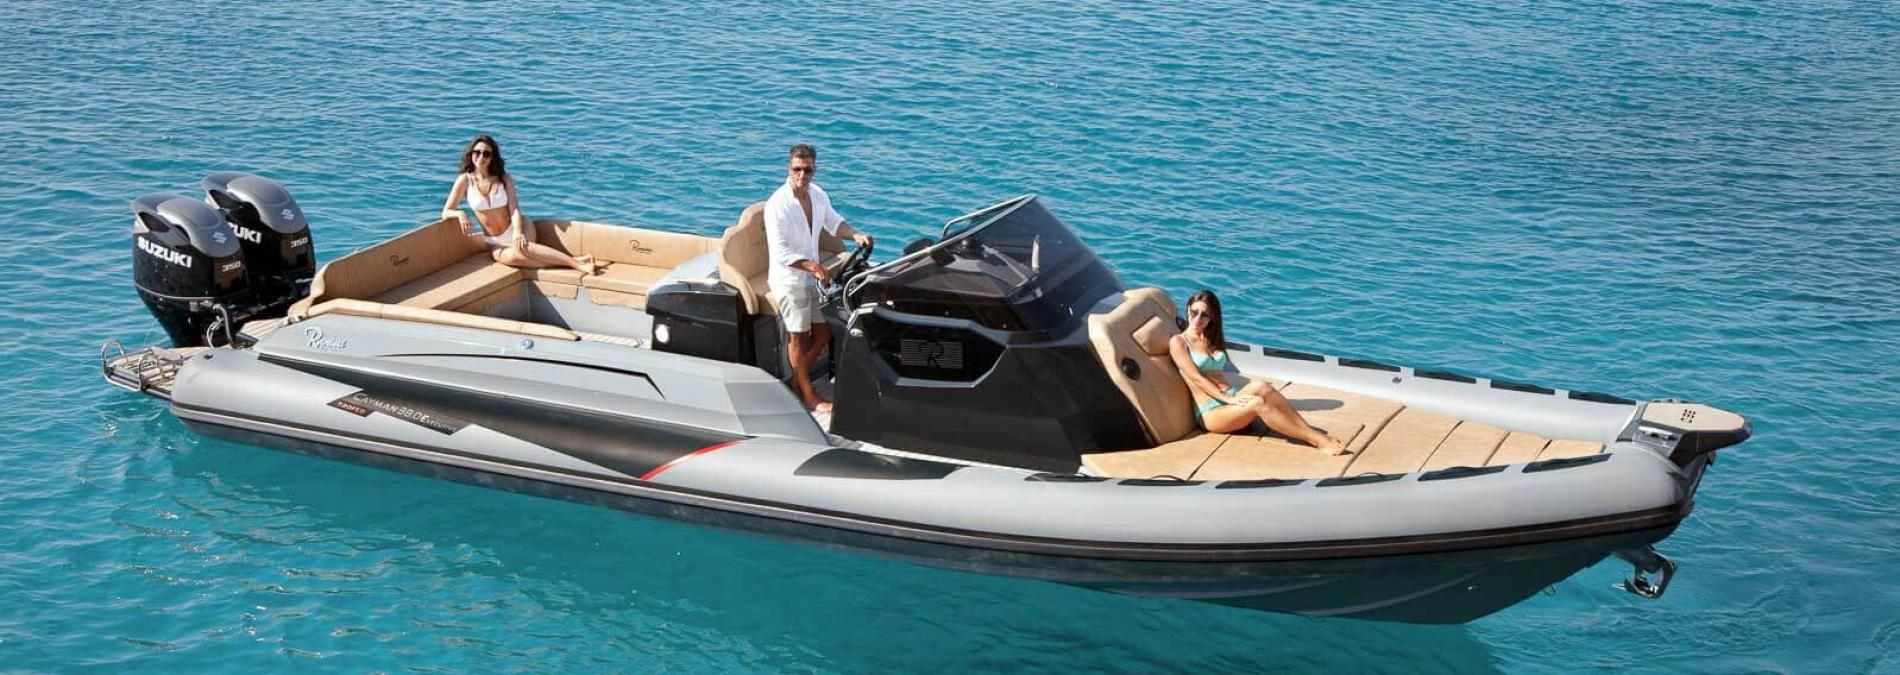 Les semi-rigides Ranieri : Cayman Line